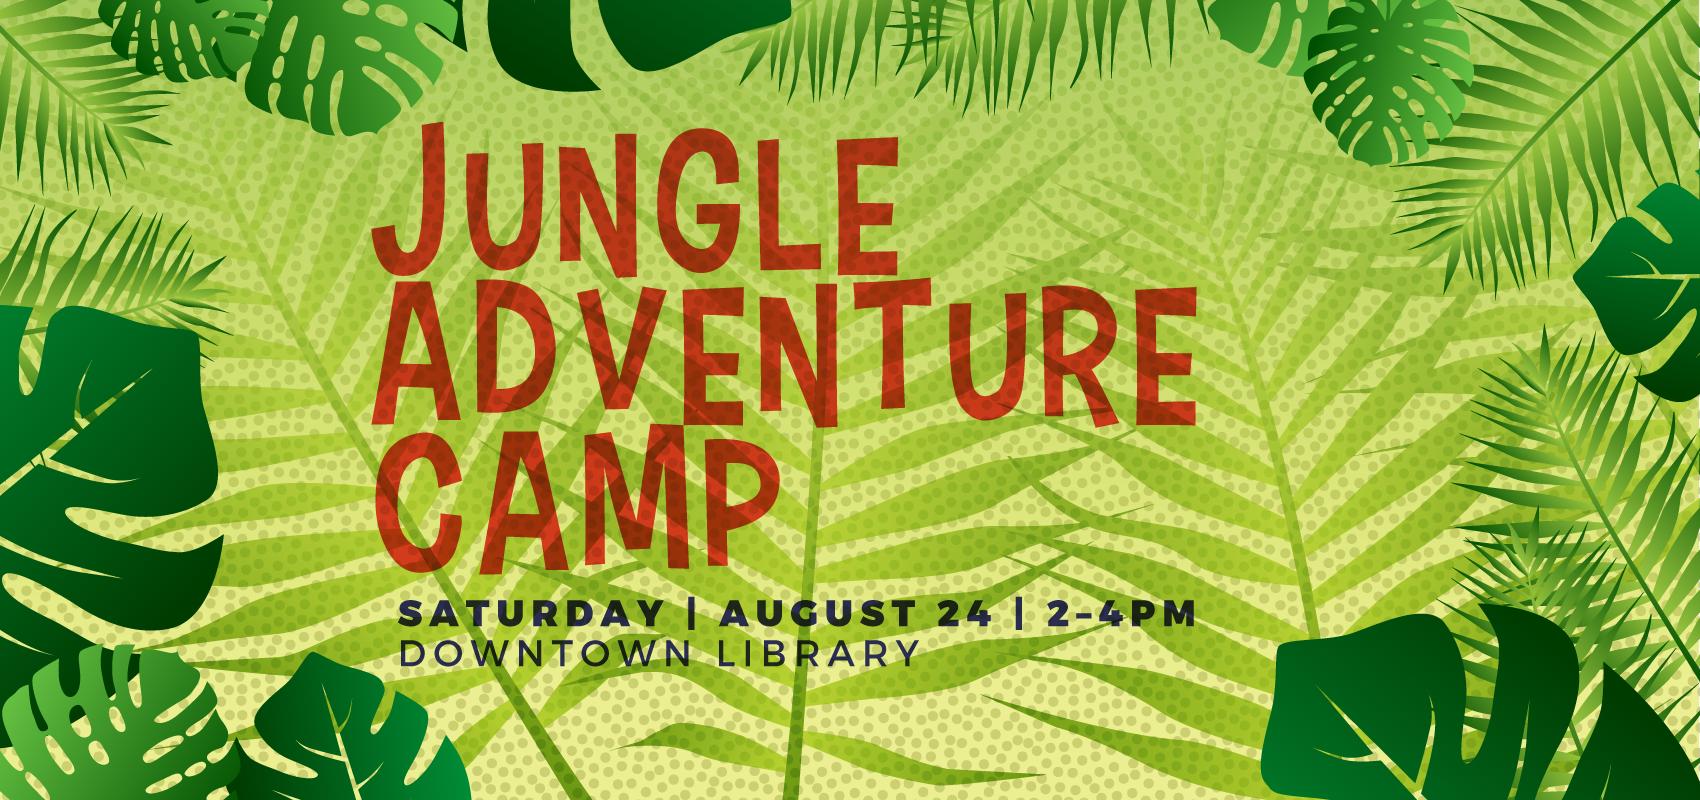 Jungle Adventure Camp! - Saturday August 24. .